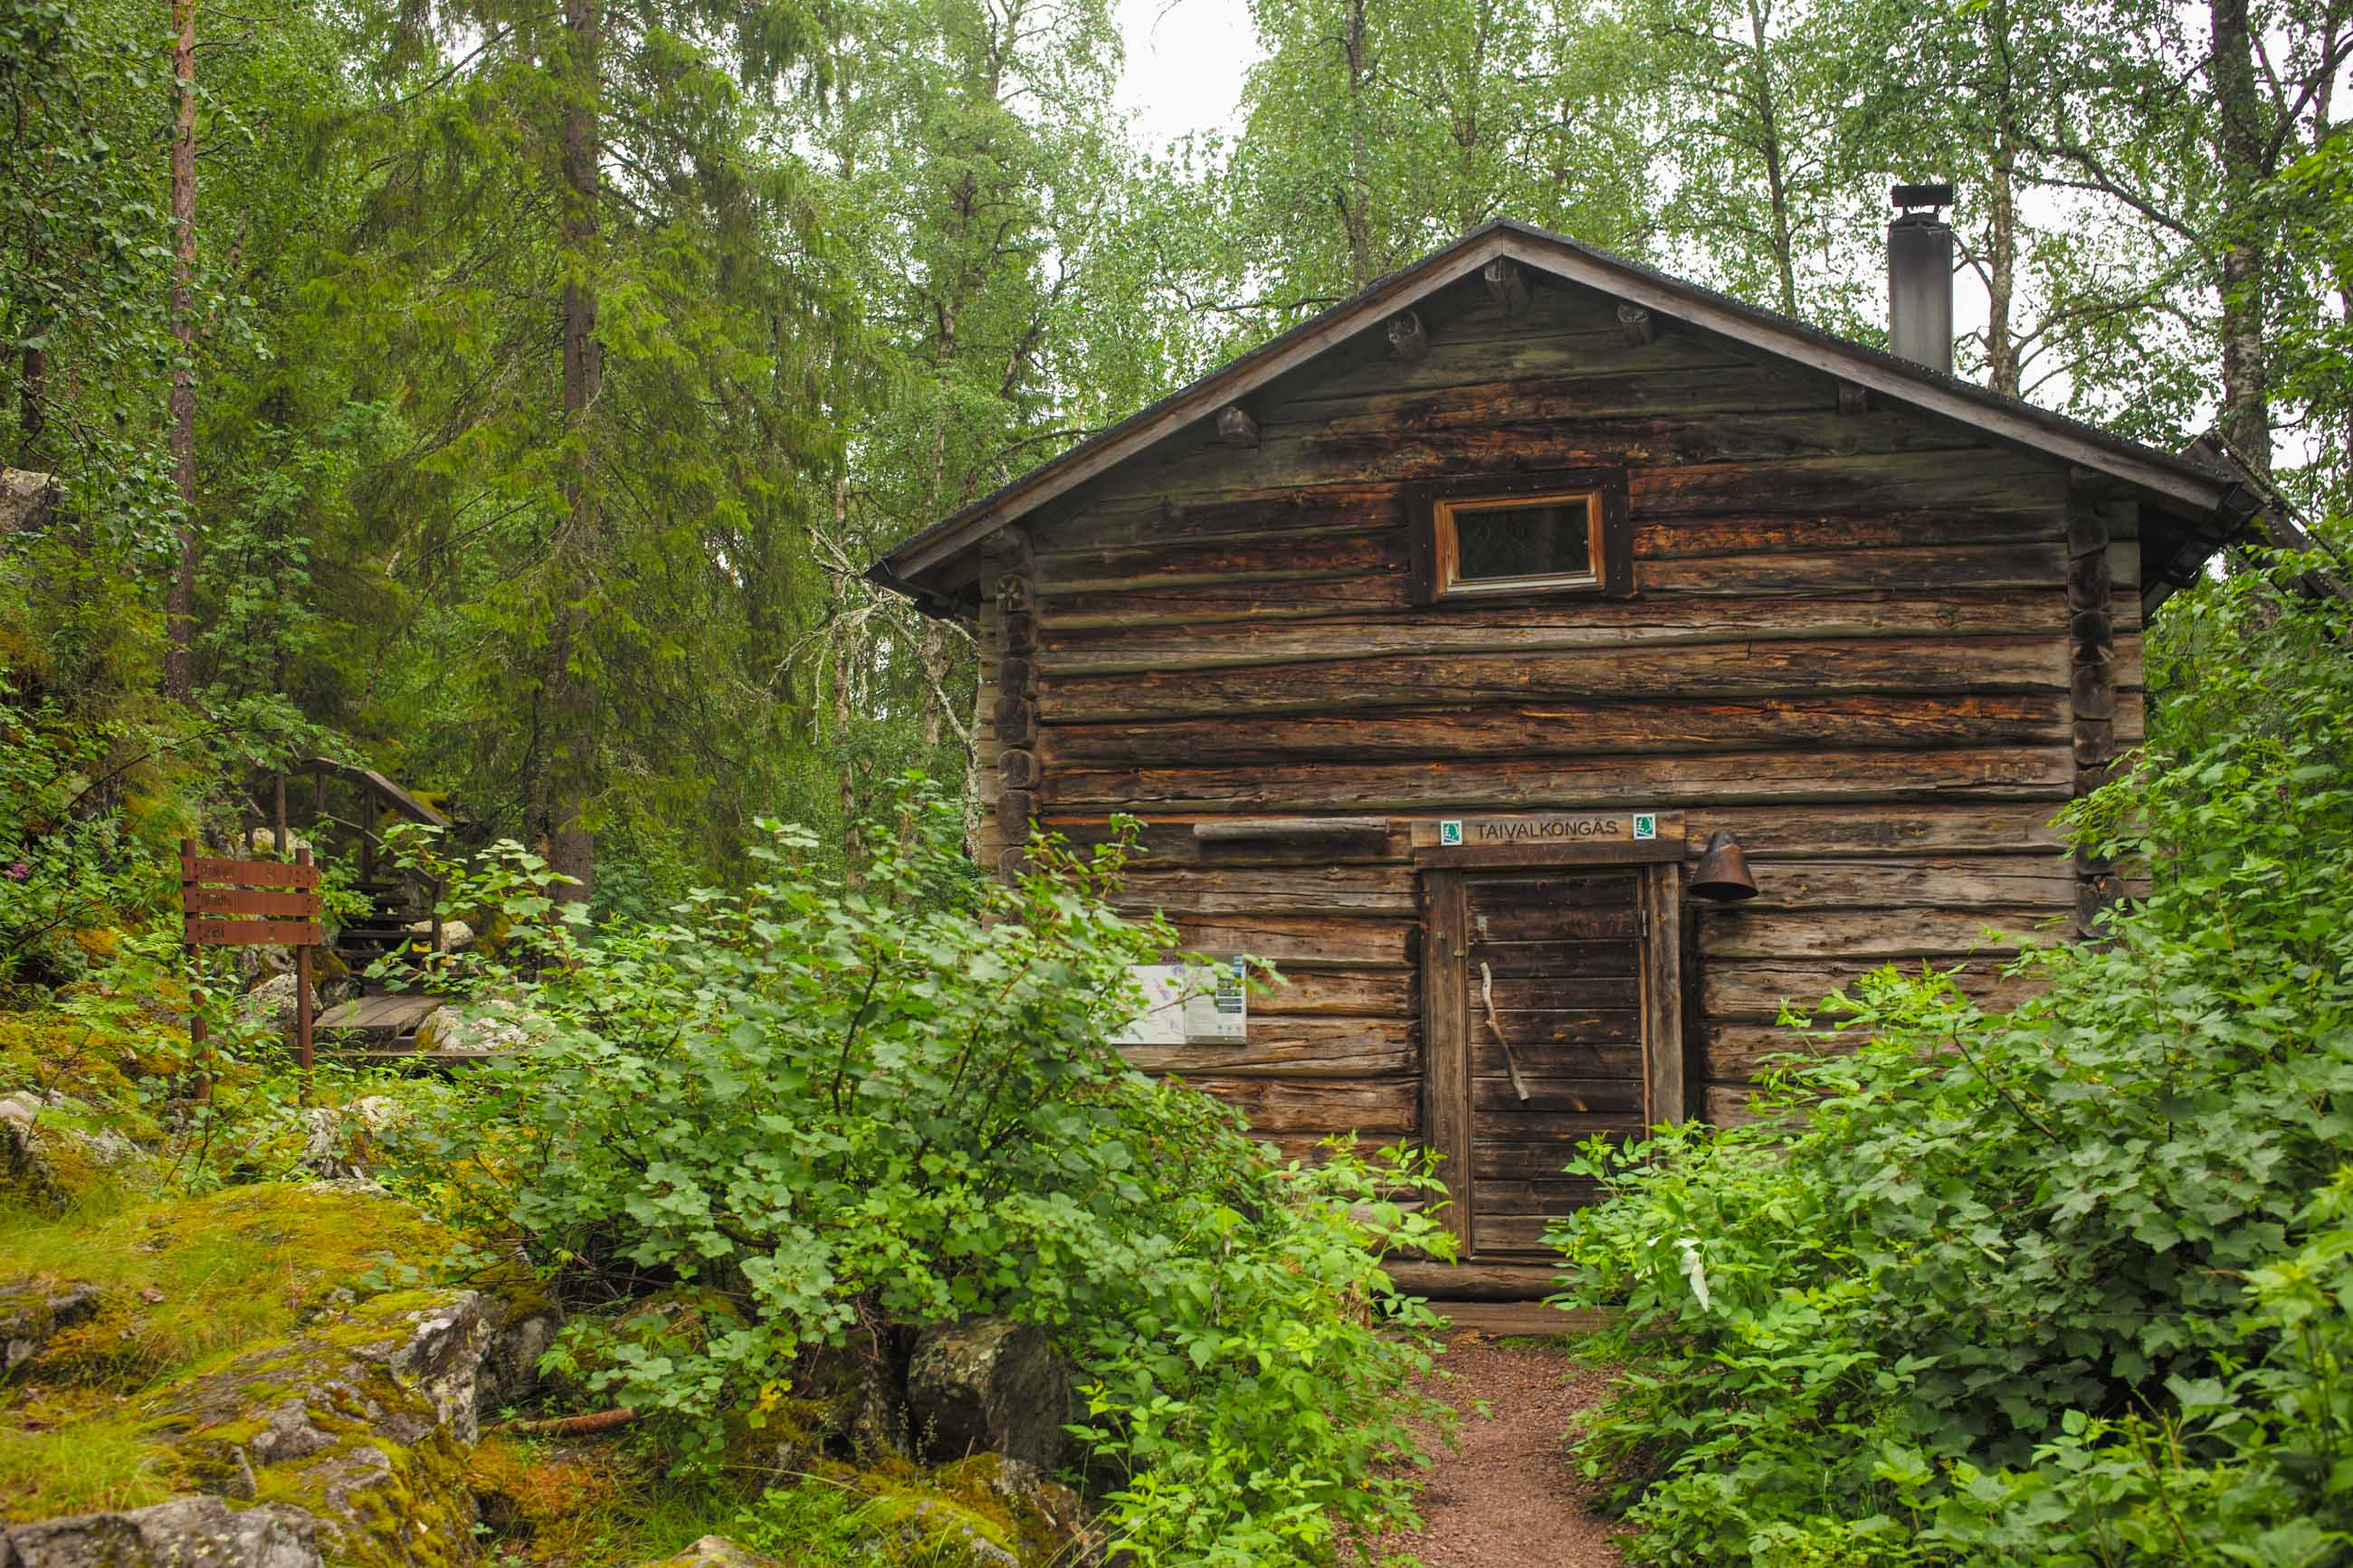 https://bubo.sk/uploads/galleries/18847/lubosfellner_finsko_polarnykruh-9-.jpg